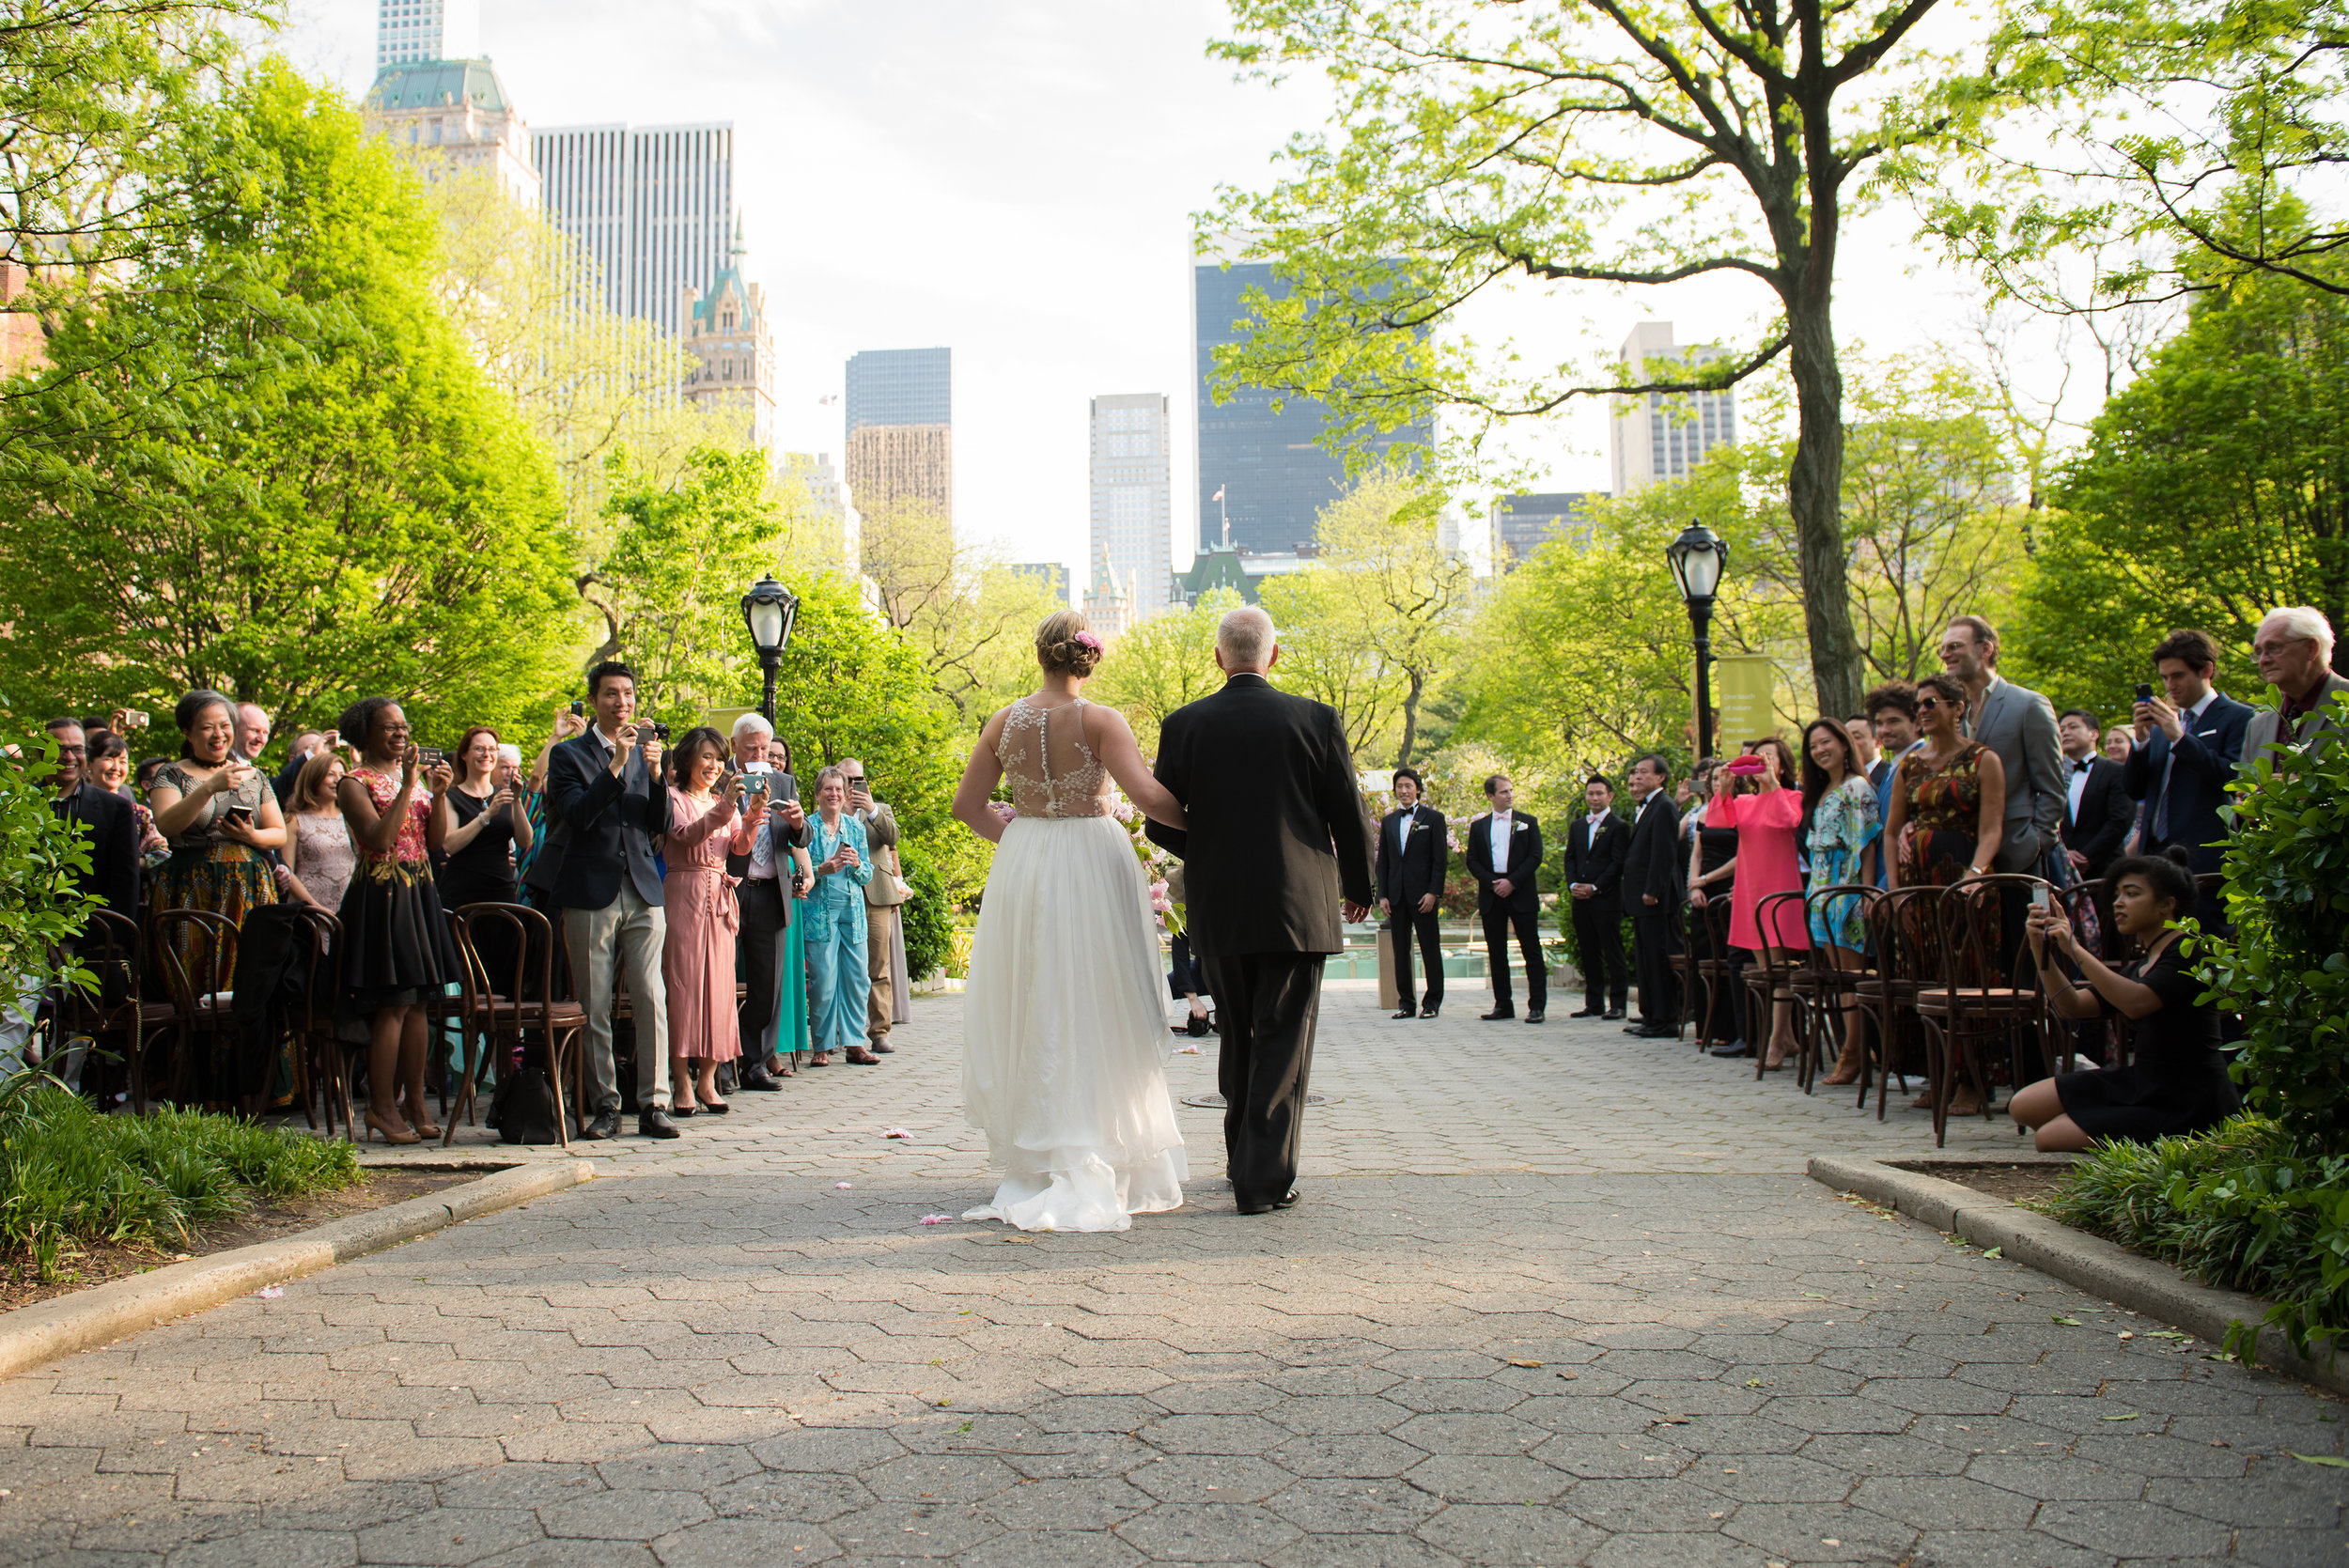 victorious-events-nyc-020-colleen-taka-central-park-zoo-wedding-raymond-hamlin.jpg